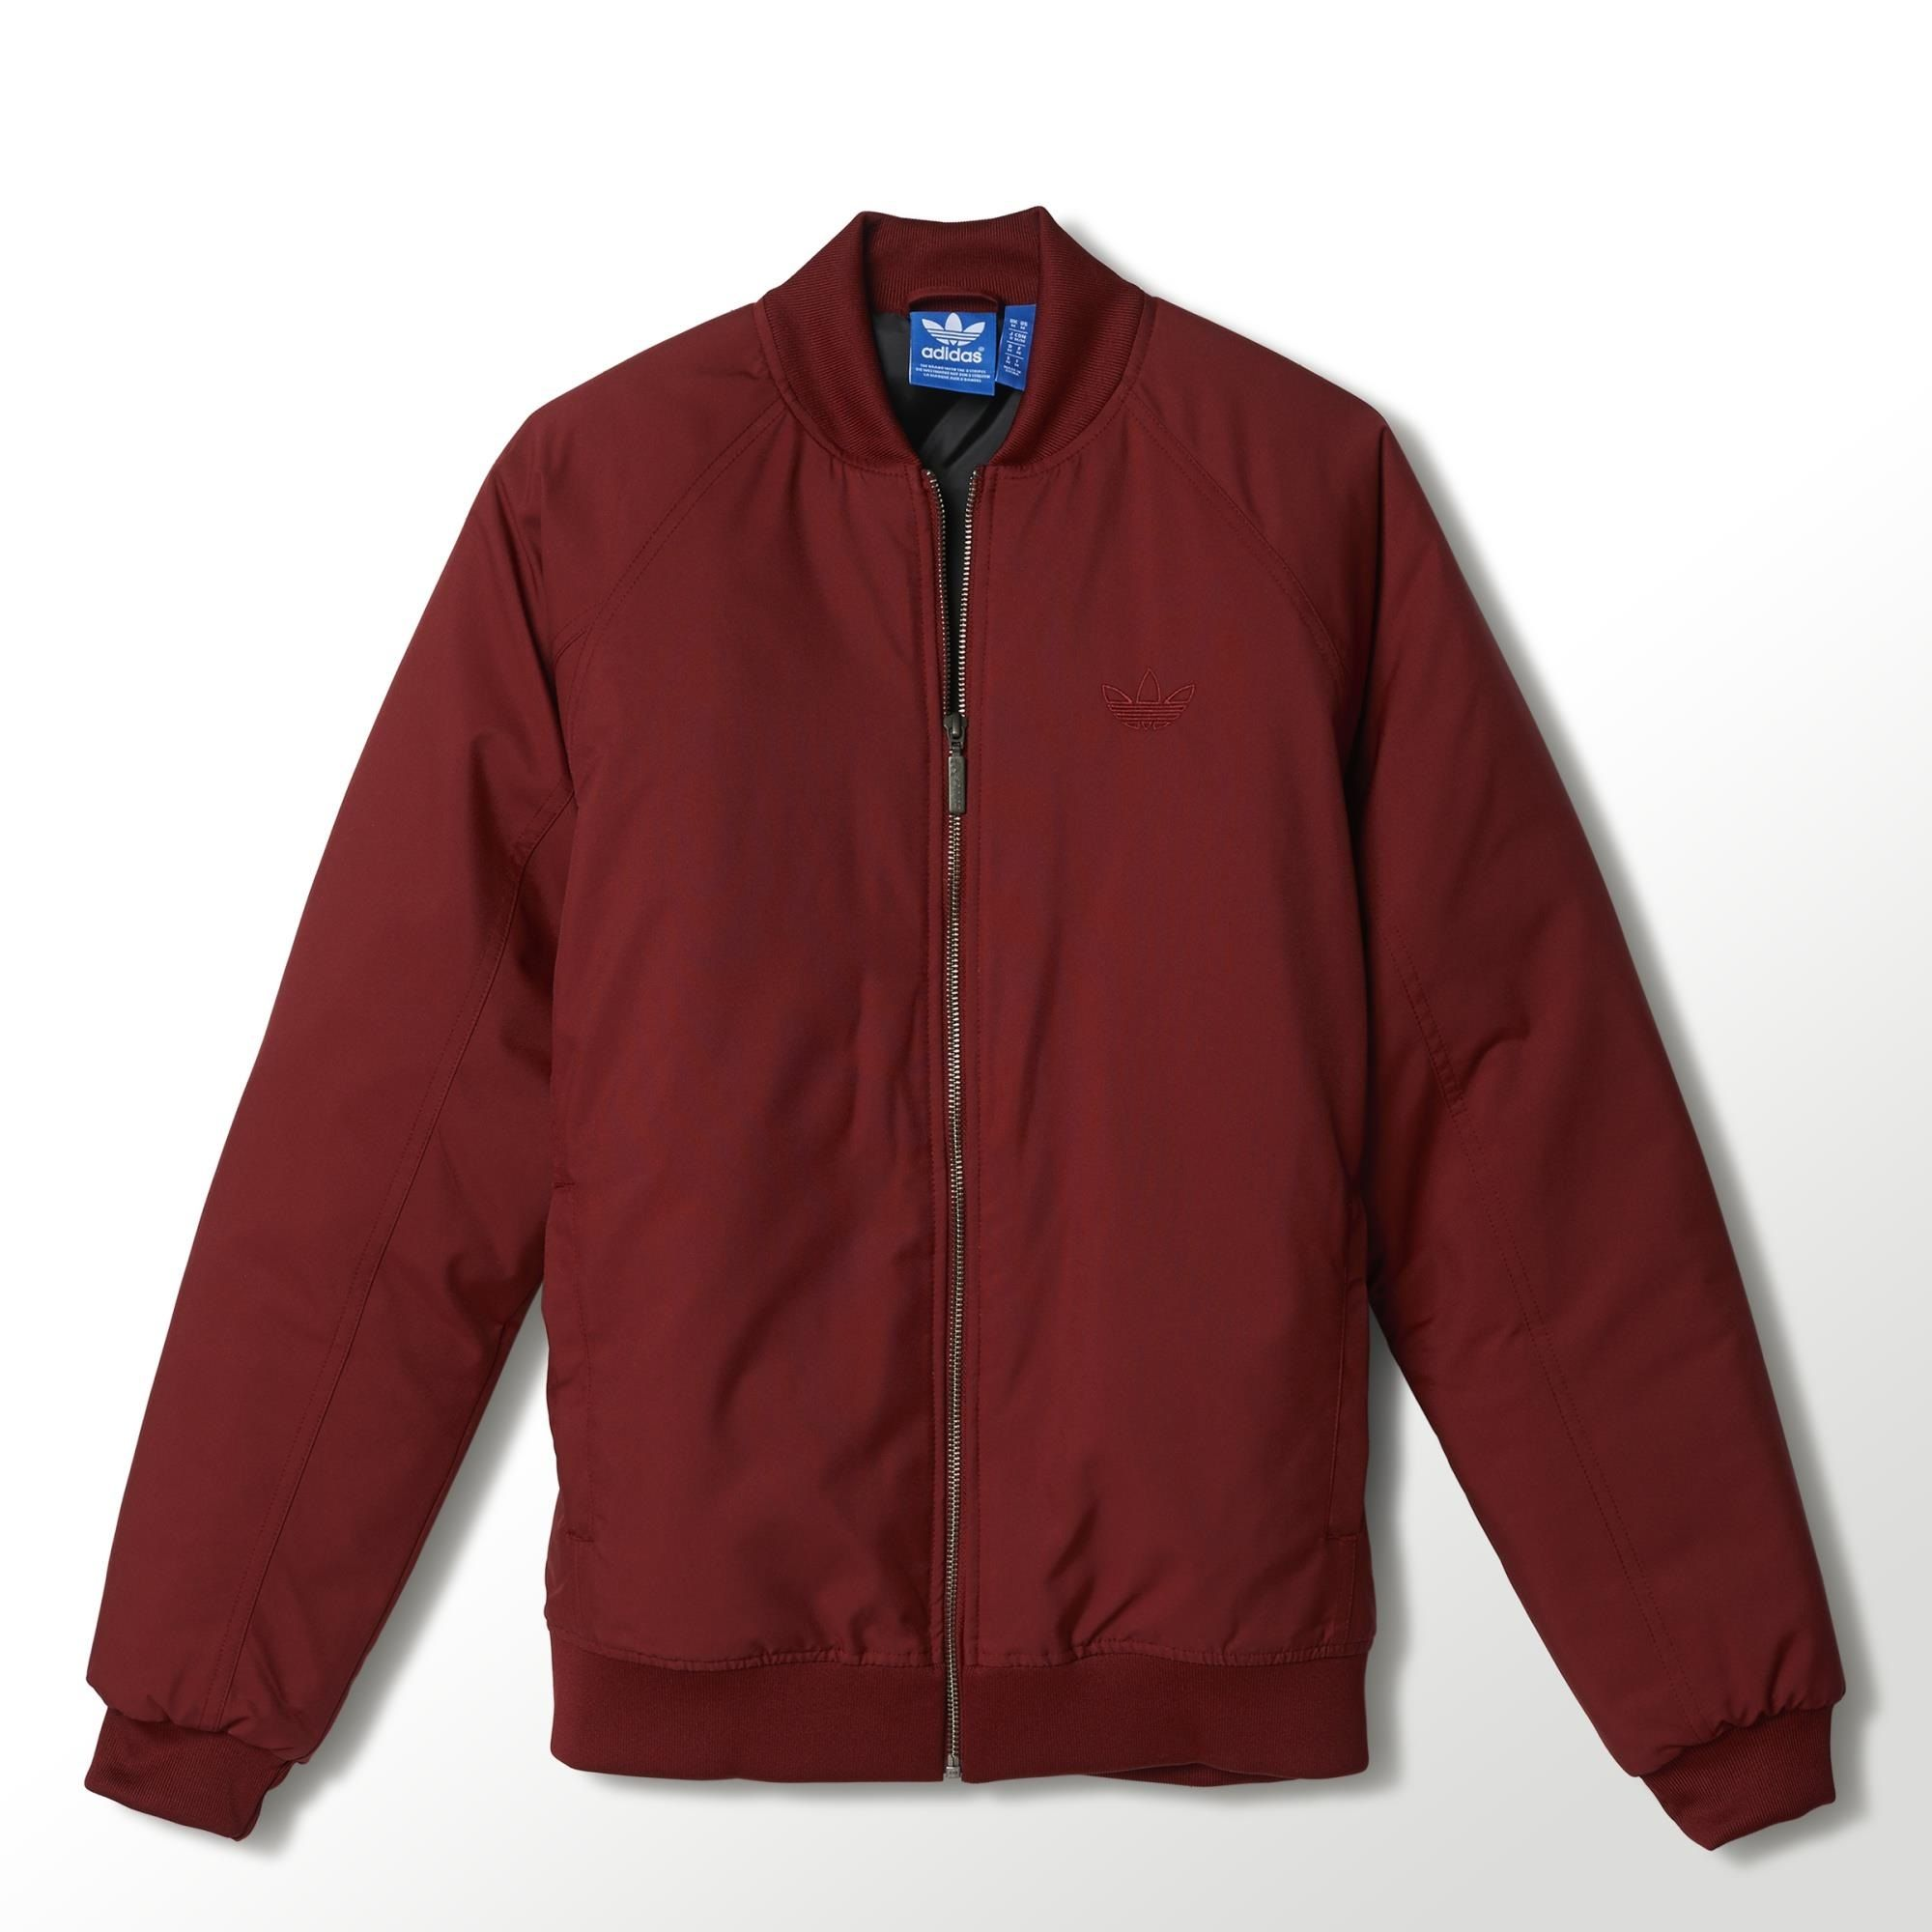 Adidas Streetwear Essentials Bomber Jacket Adidas Uk Jackets Street Wear Urban Bomber Jacket [ 2000 x 2000 Pixel ]